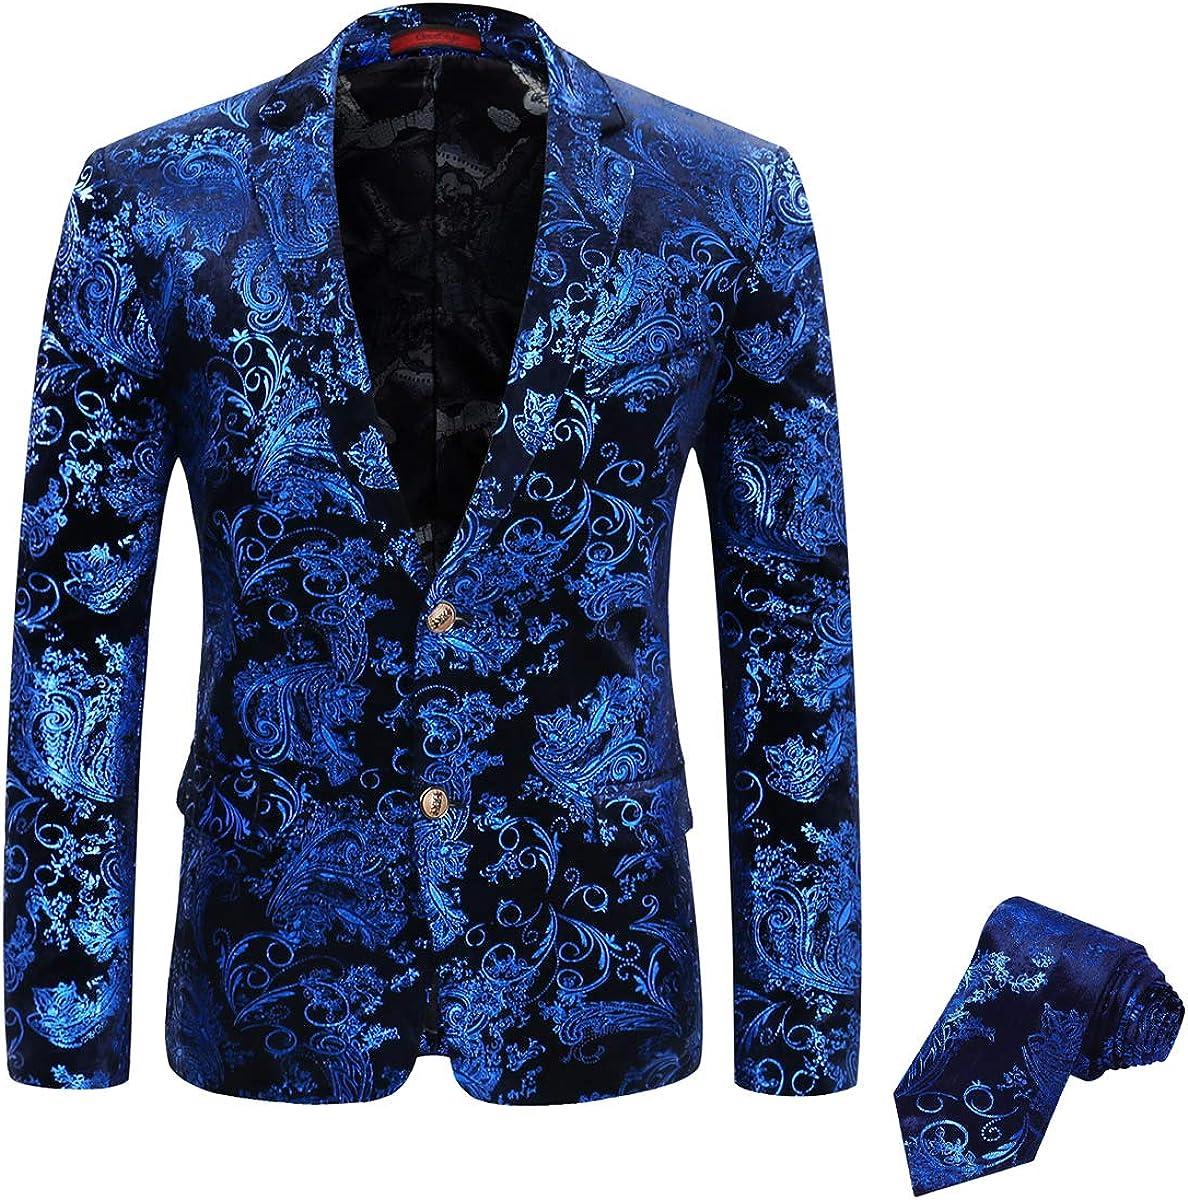 Mens Floral Tux Suit Jacket with Tie, Slim Party Dinner Dress Blazer with Print Tie